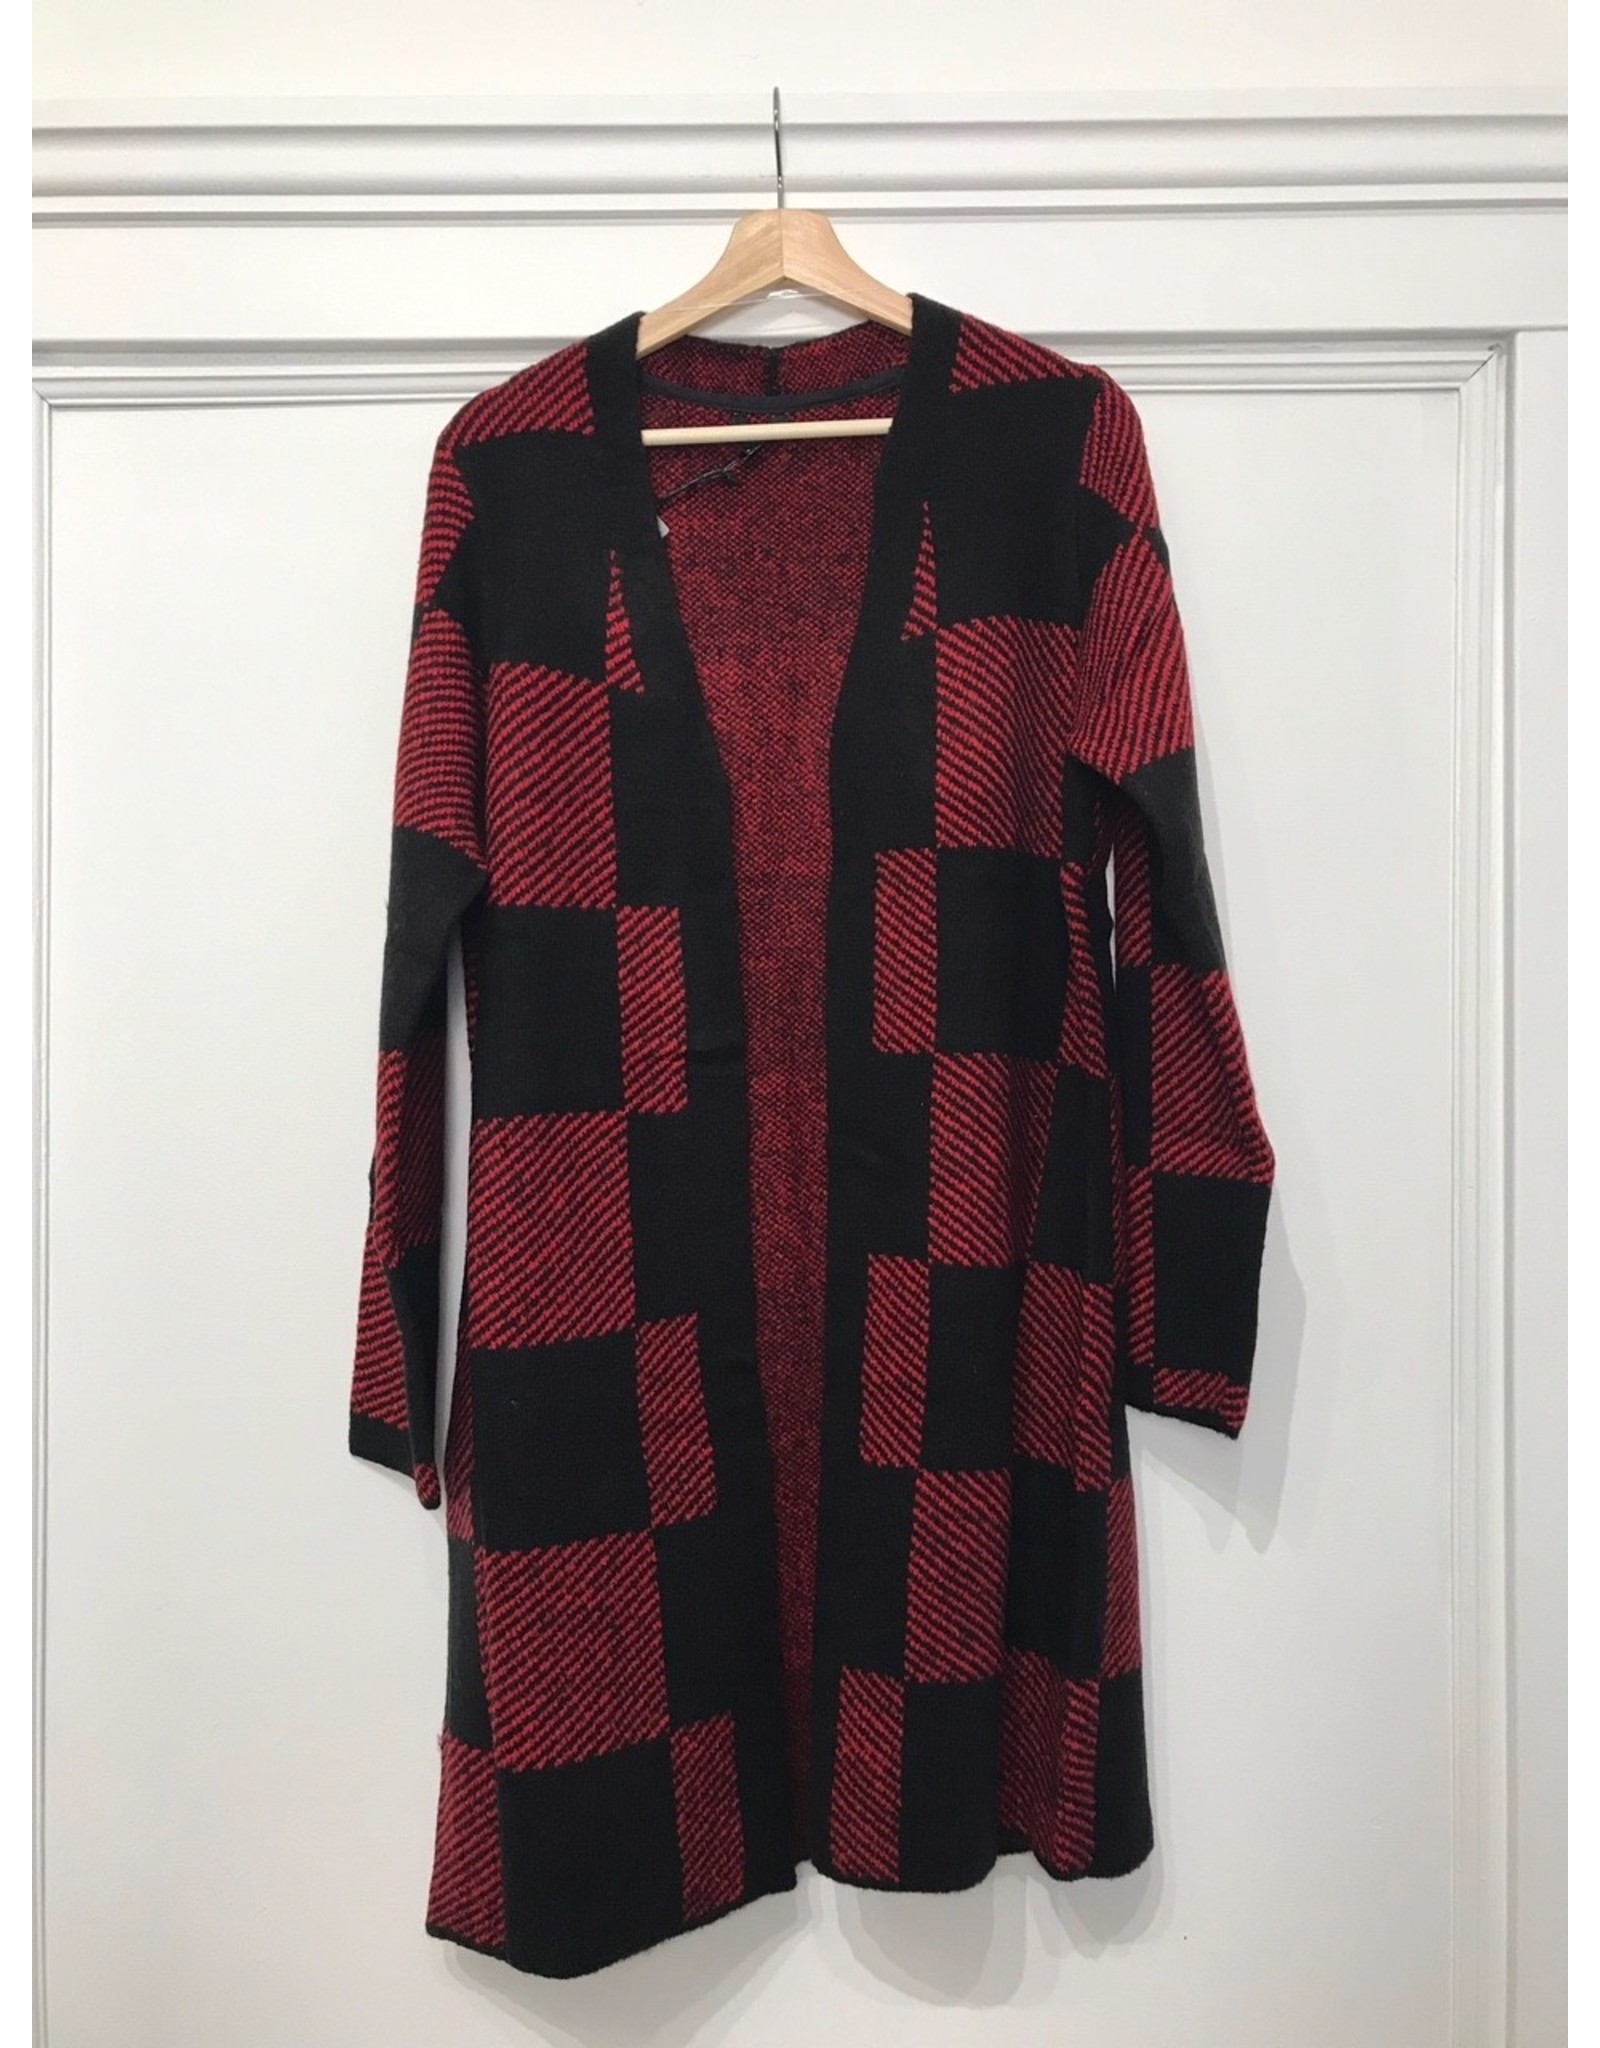 Yest Yest - Buffalo plaid knit cardigan